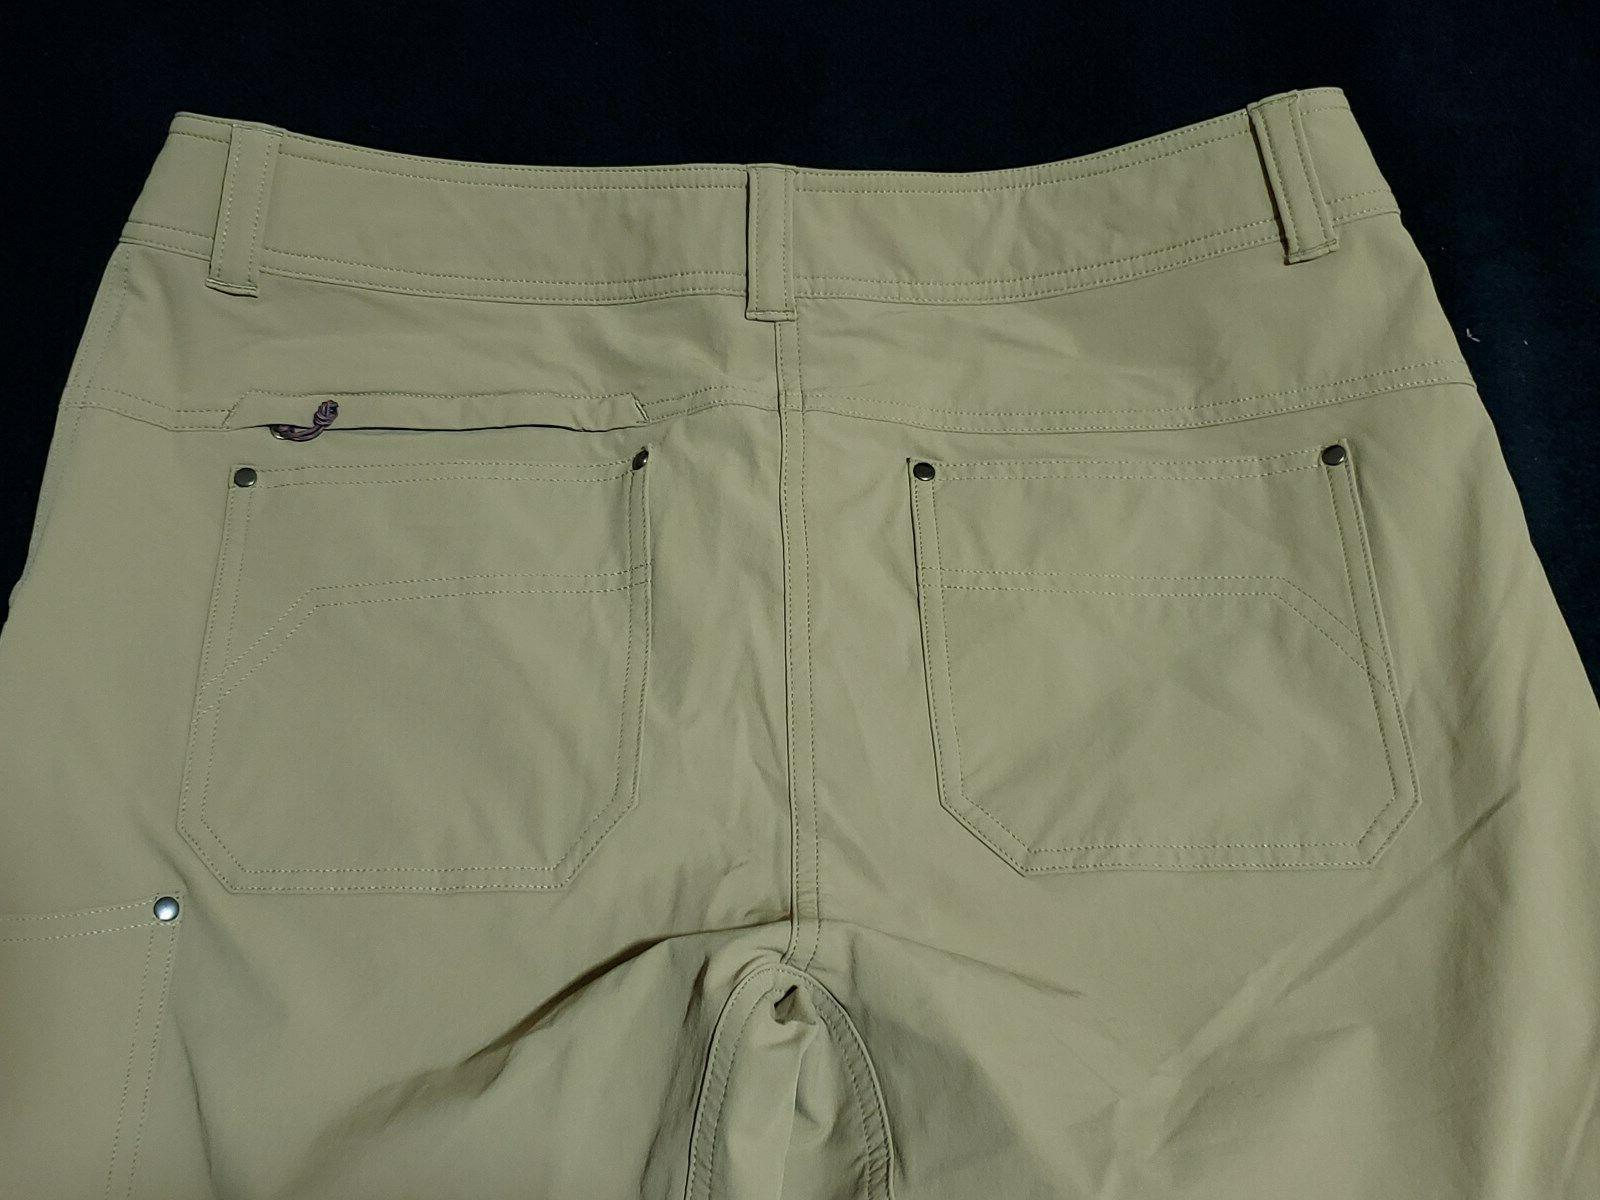 NWOT SITKA Men's KHAKI Pants